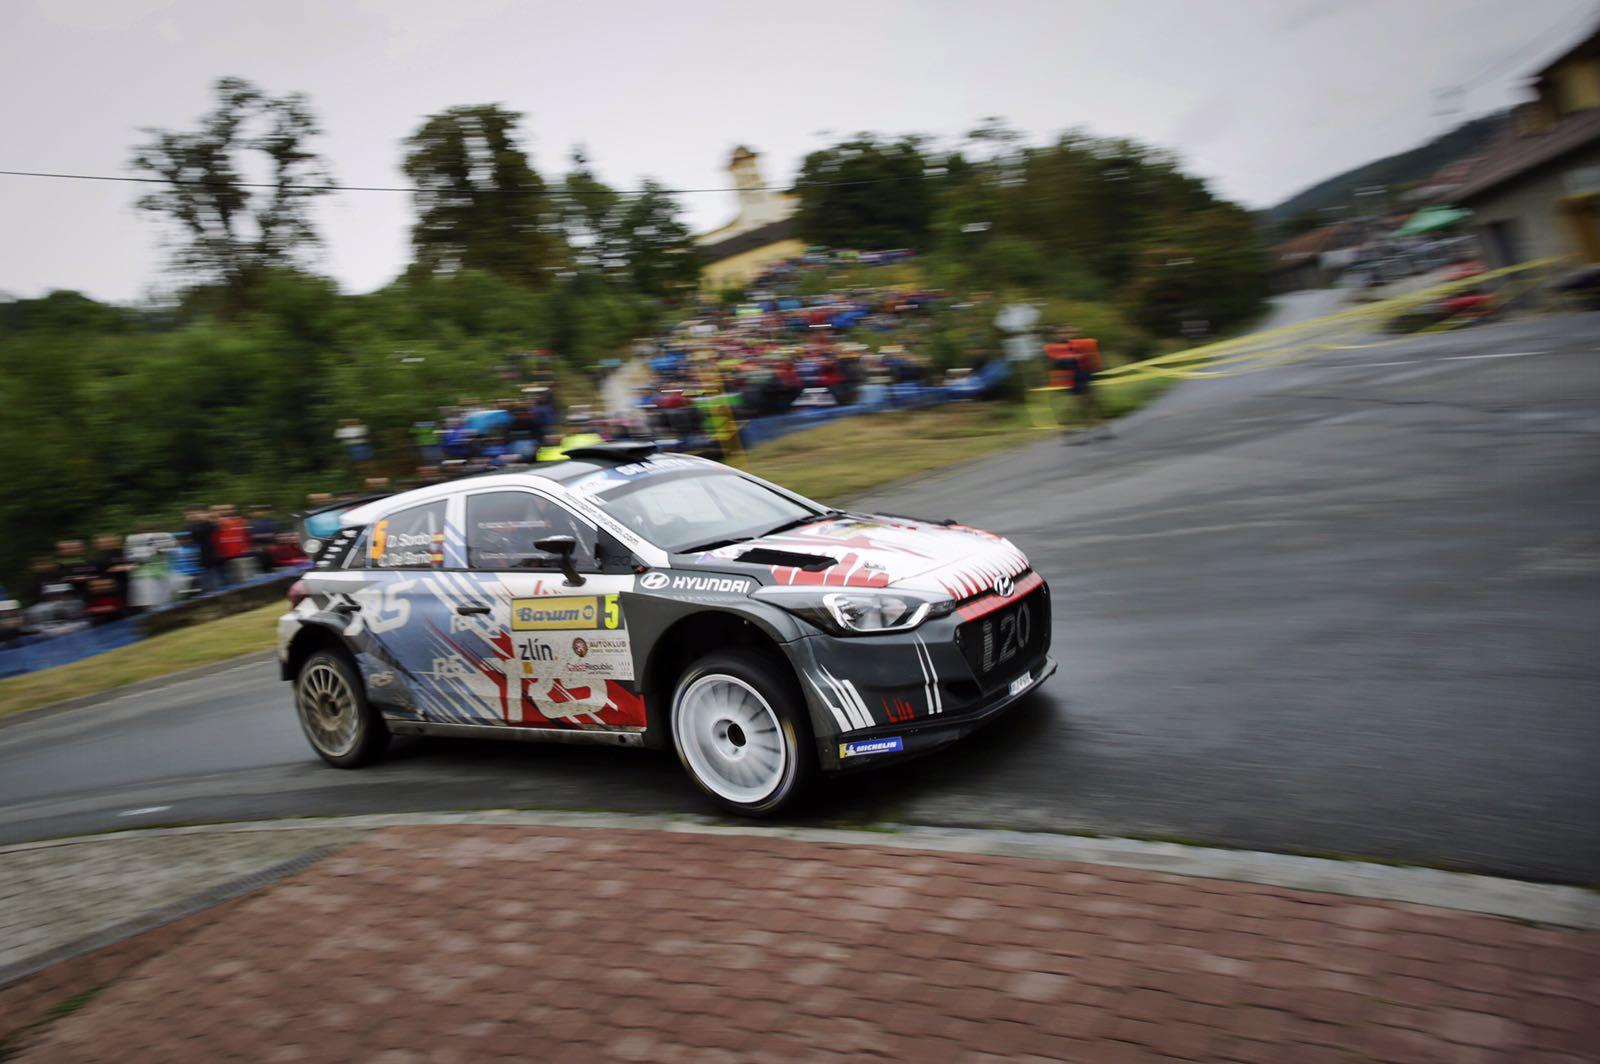 Rally Barum 2018 ERC - Página 3 Dlhe4PGWsAAtFMY